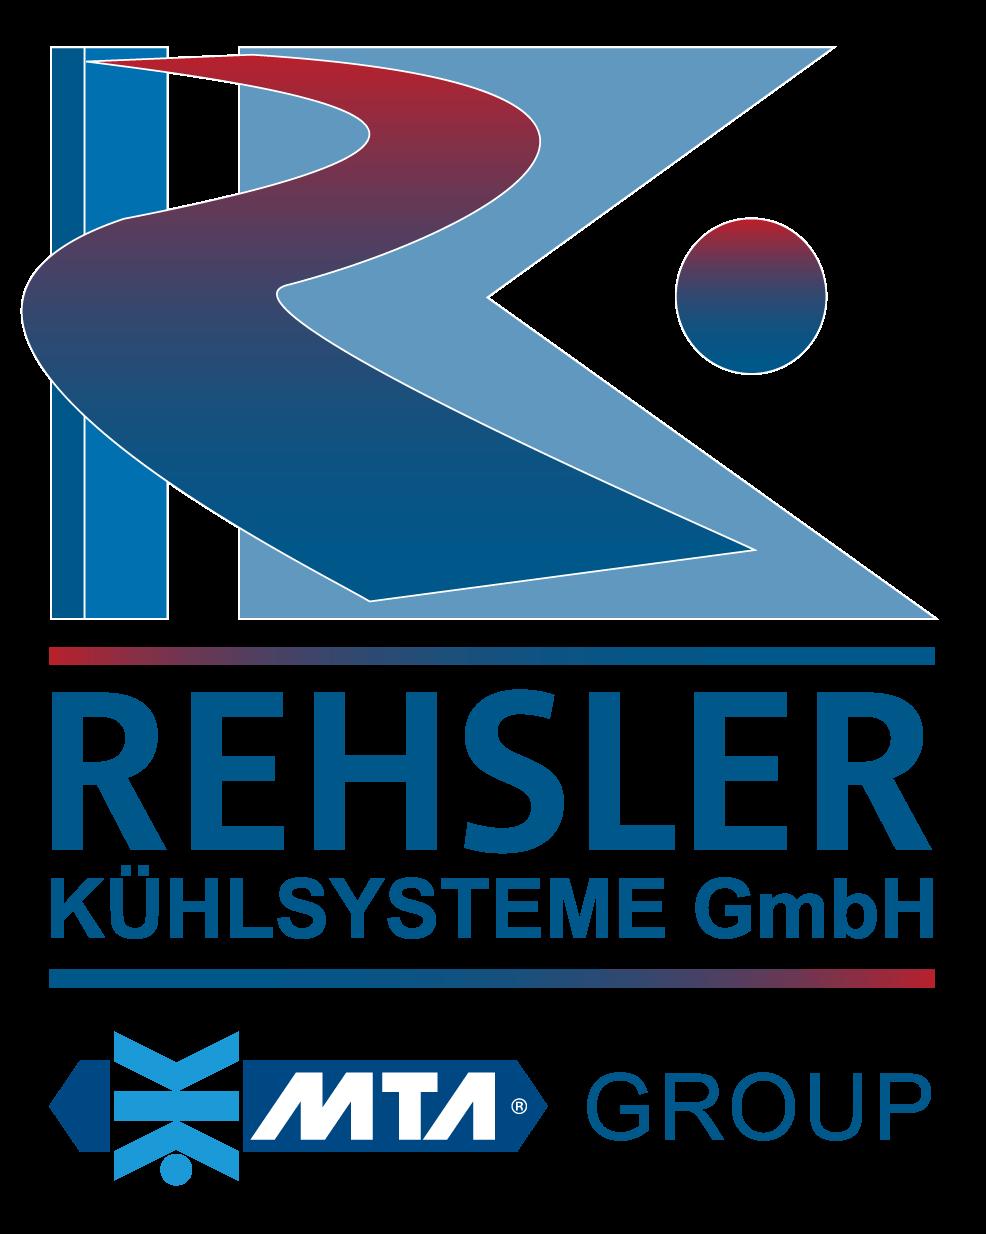 Rehsler Kuehlsysteme GmbH MTA Group